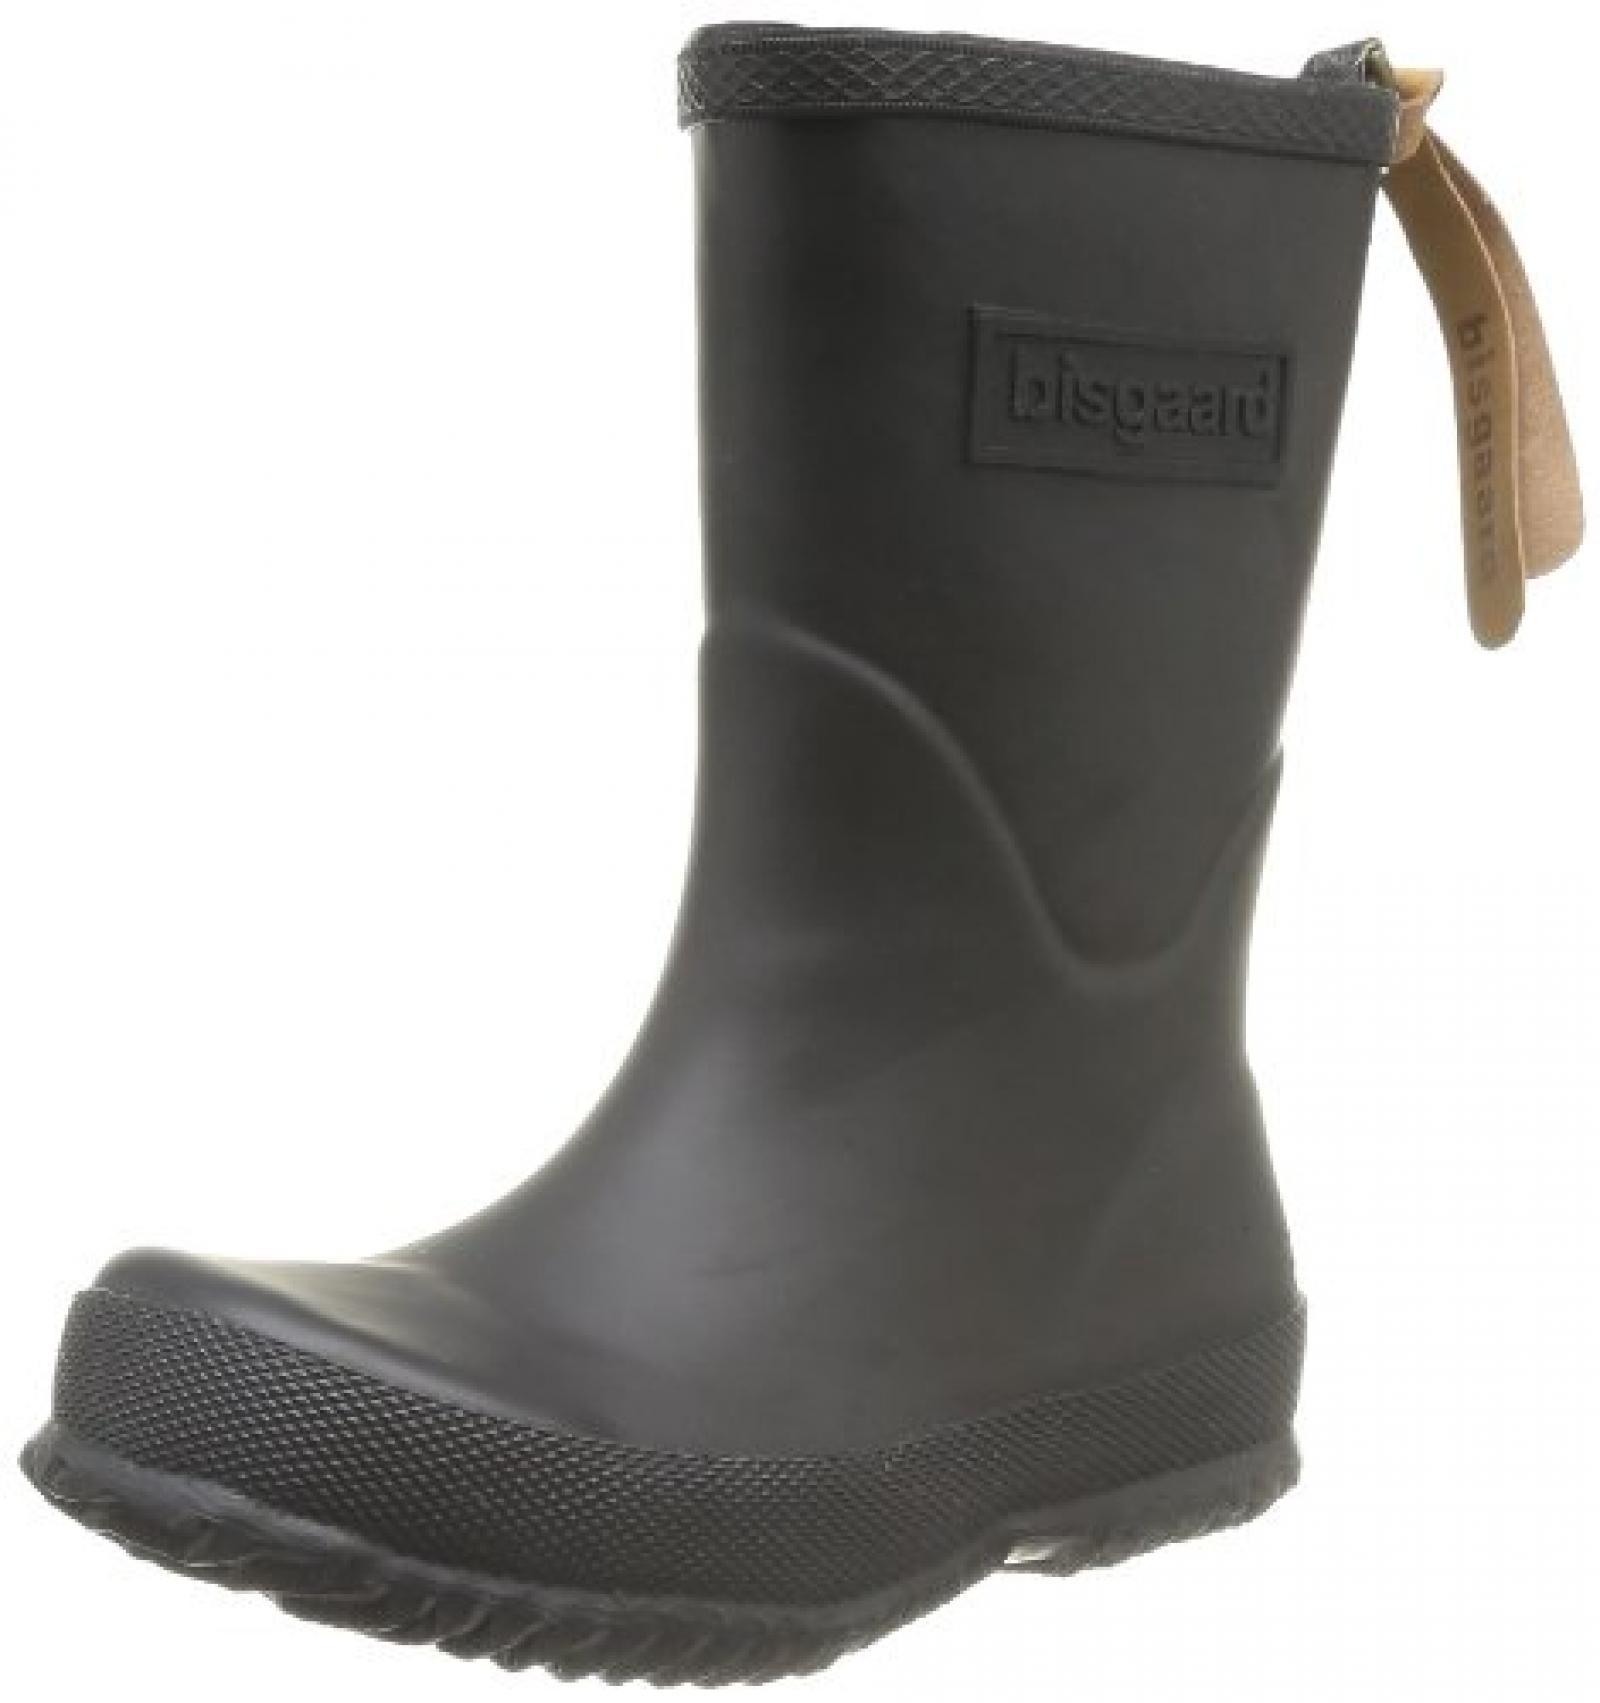 Bisgaard LRK001 Unisex - Kinder Stiefel